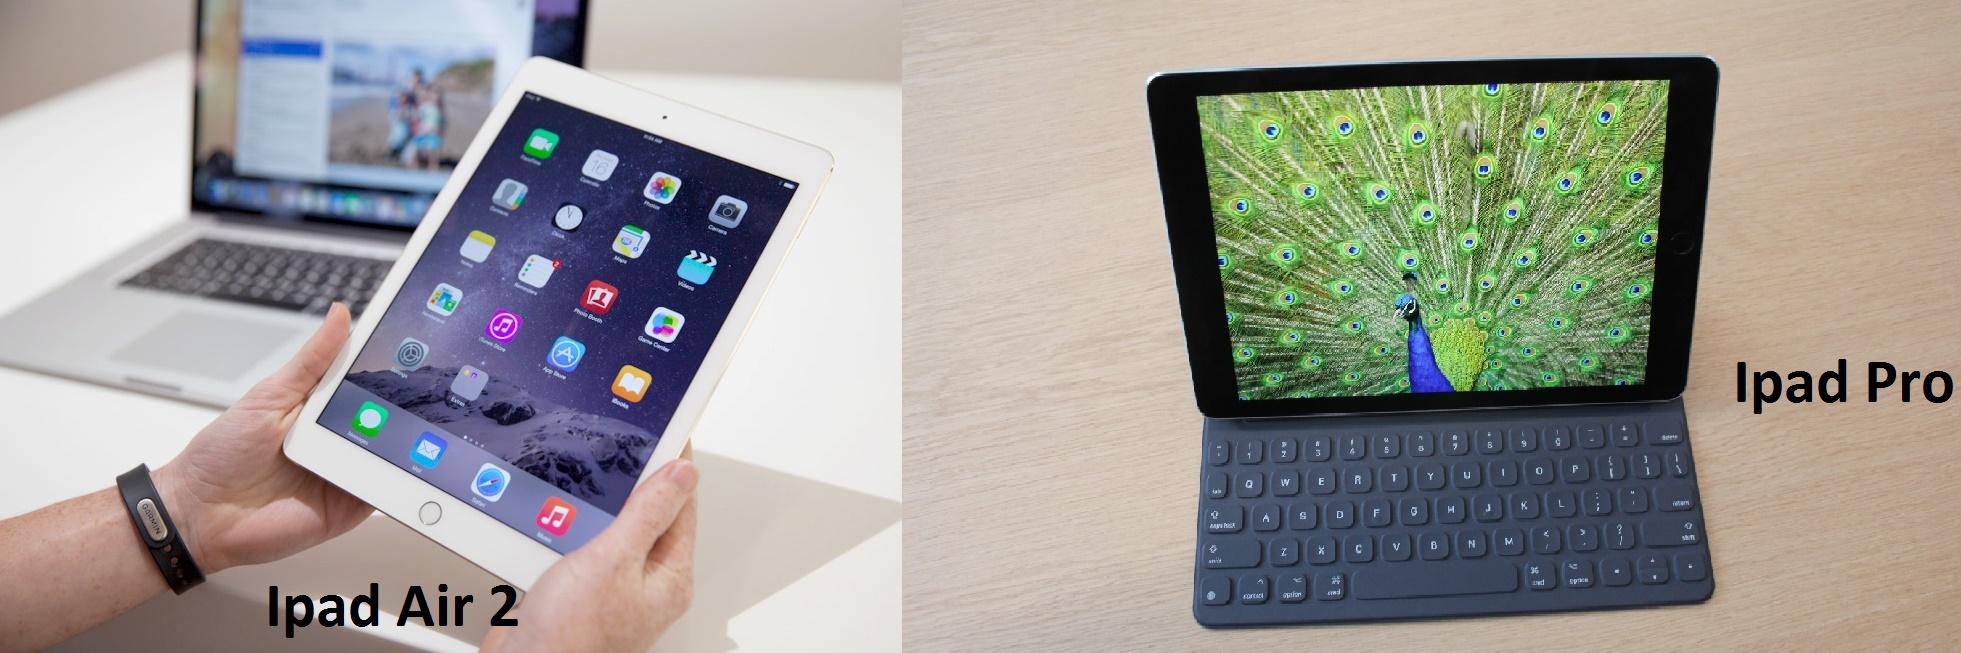 Apple Ipad Pro vs Apple Air 2 Full Specs Features